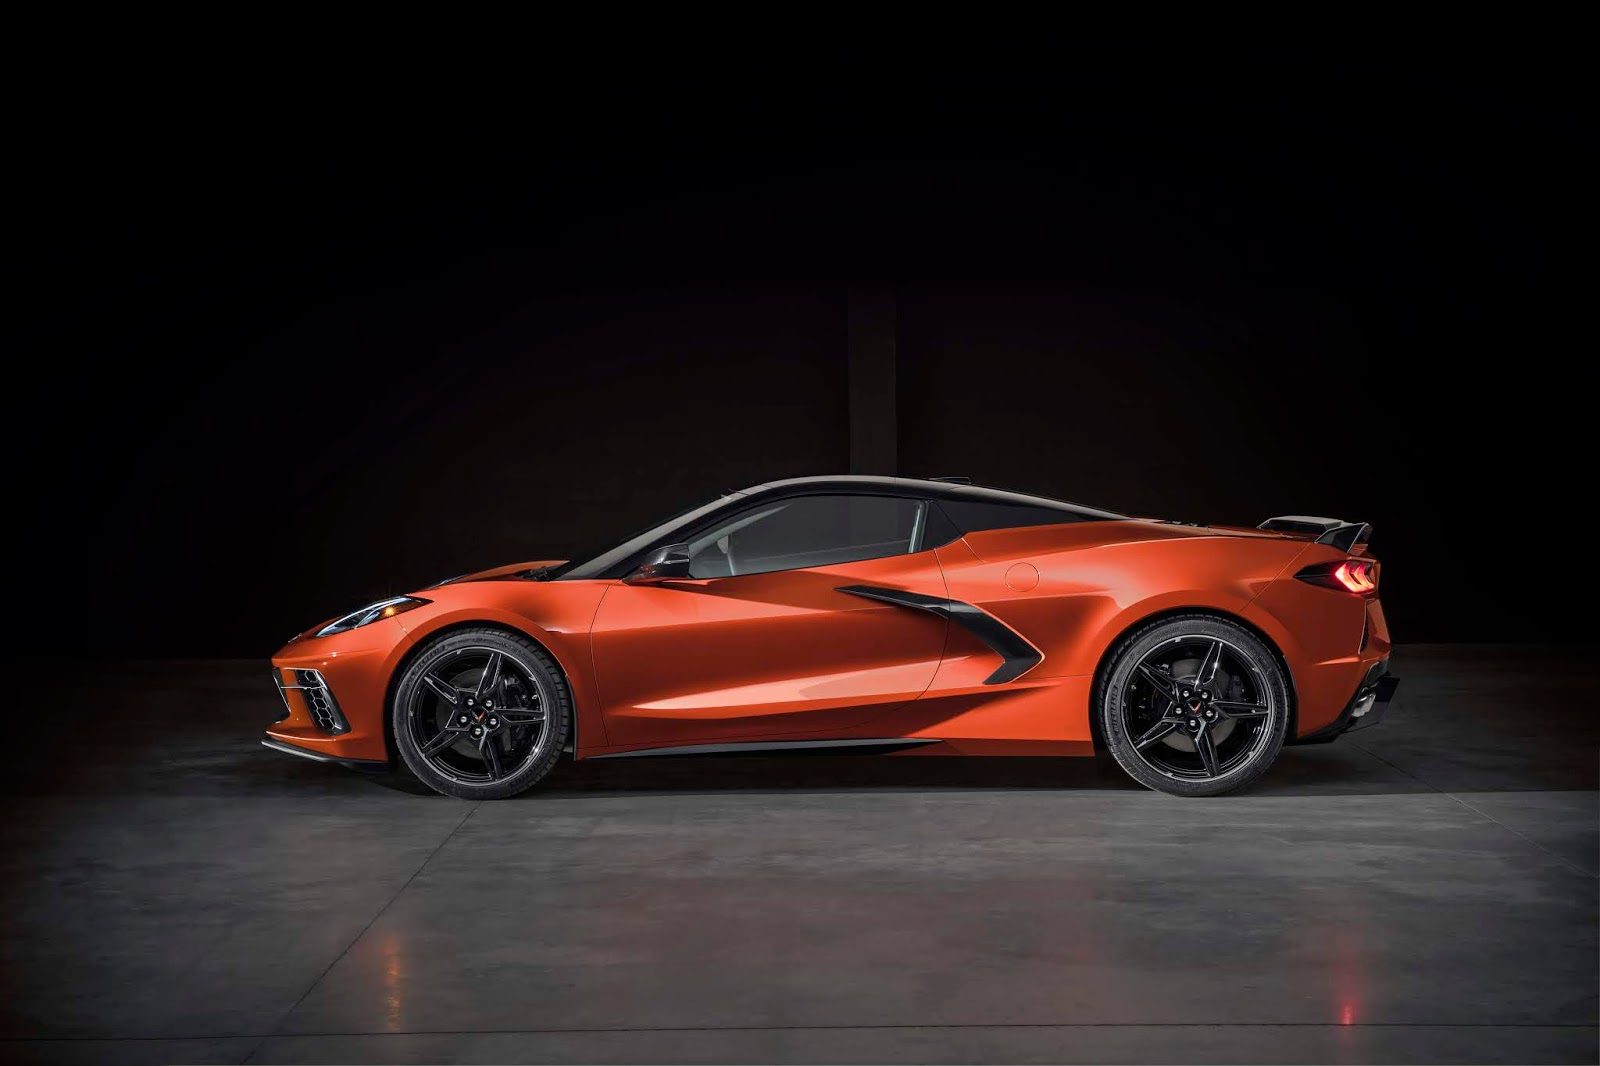 2020 Chevrolet Corvette Stingray Convertible 012 Γιατί η C8 Convertible είναι η καλύτερη Corvette ever C8, Chevrolet, Chevrolet Corvette, Corvette, zblog, ειδήσεις, καινούργιο, καινούρια, καινούριο